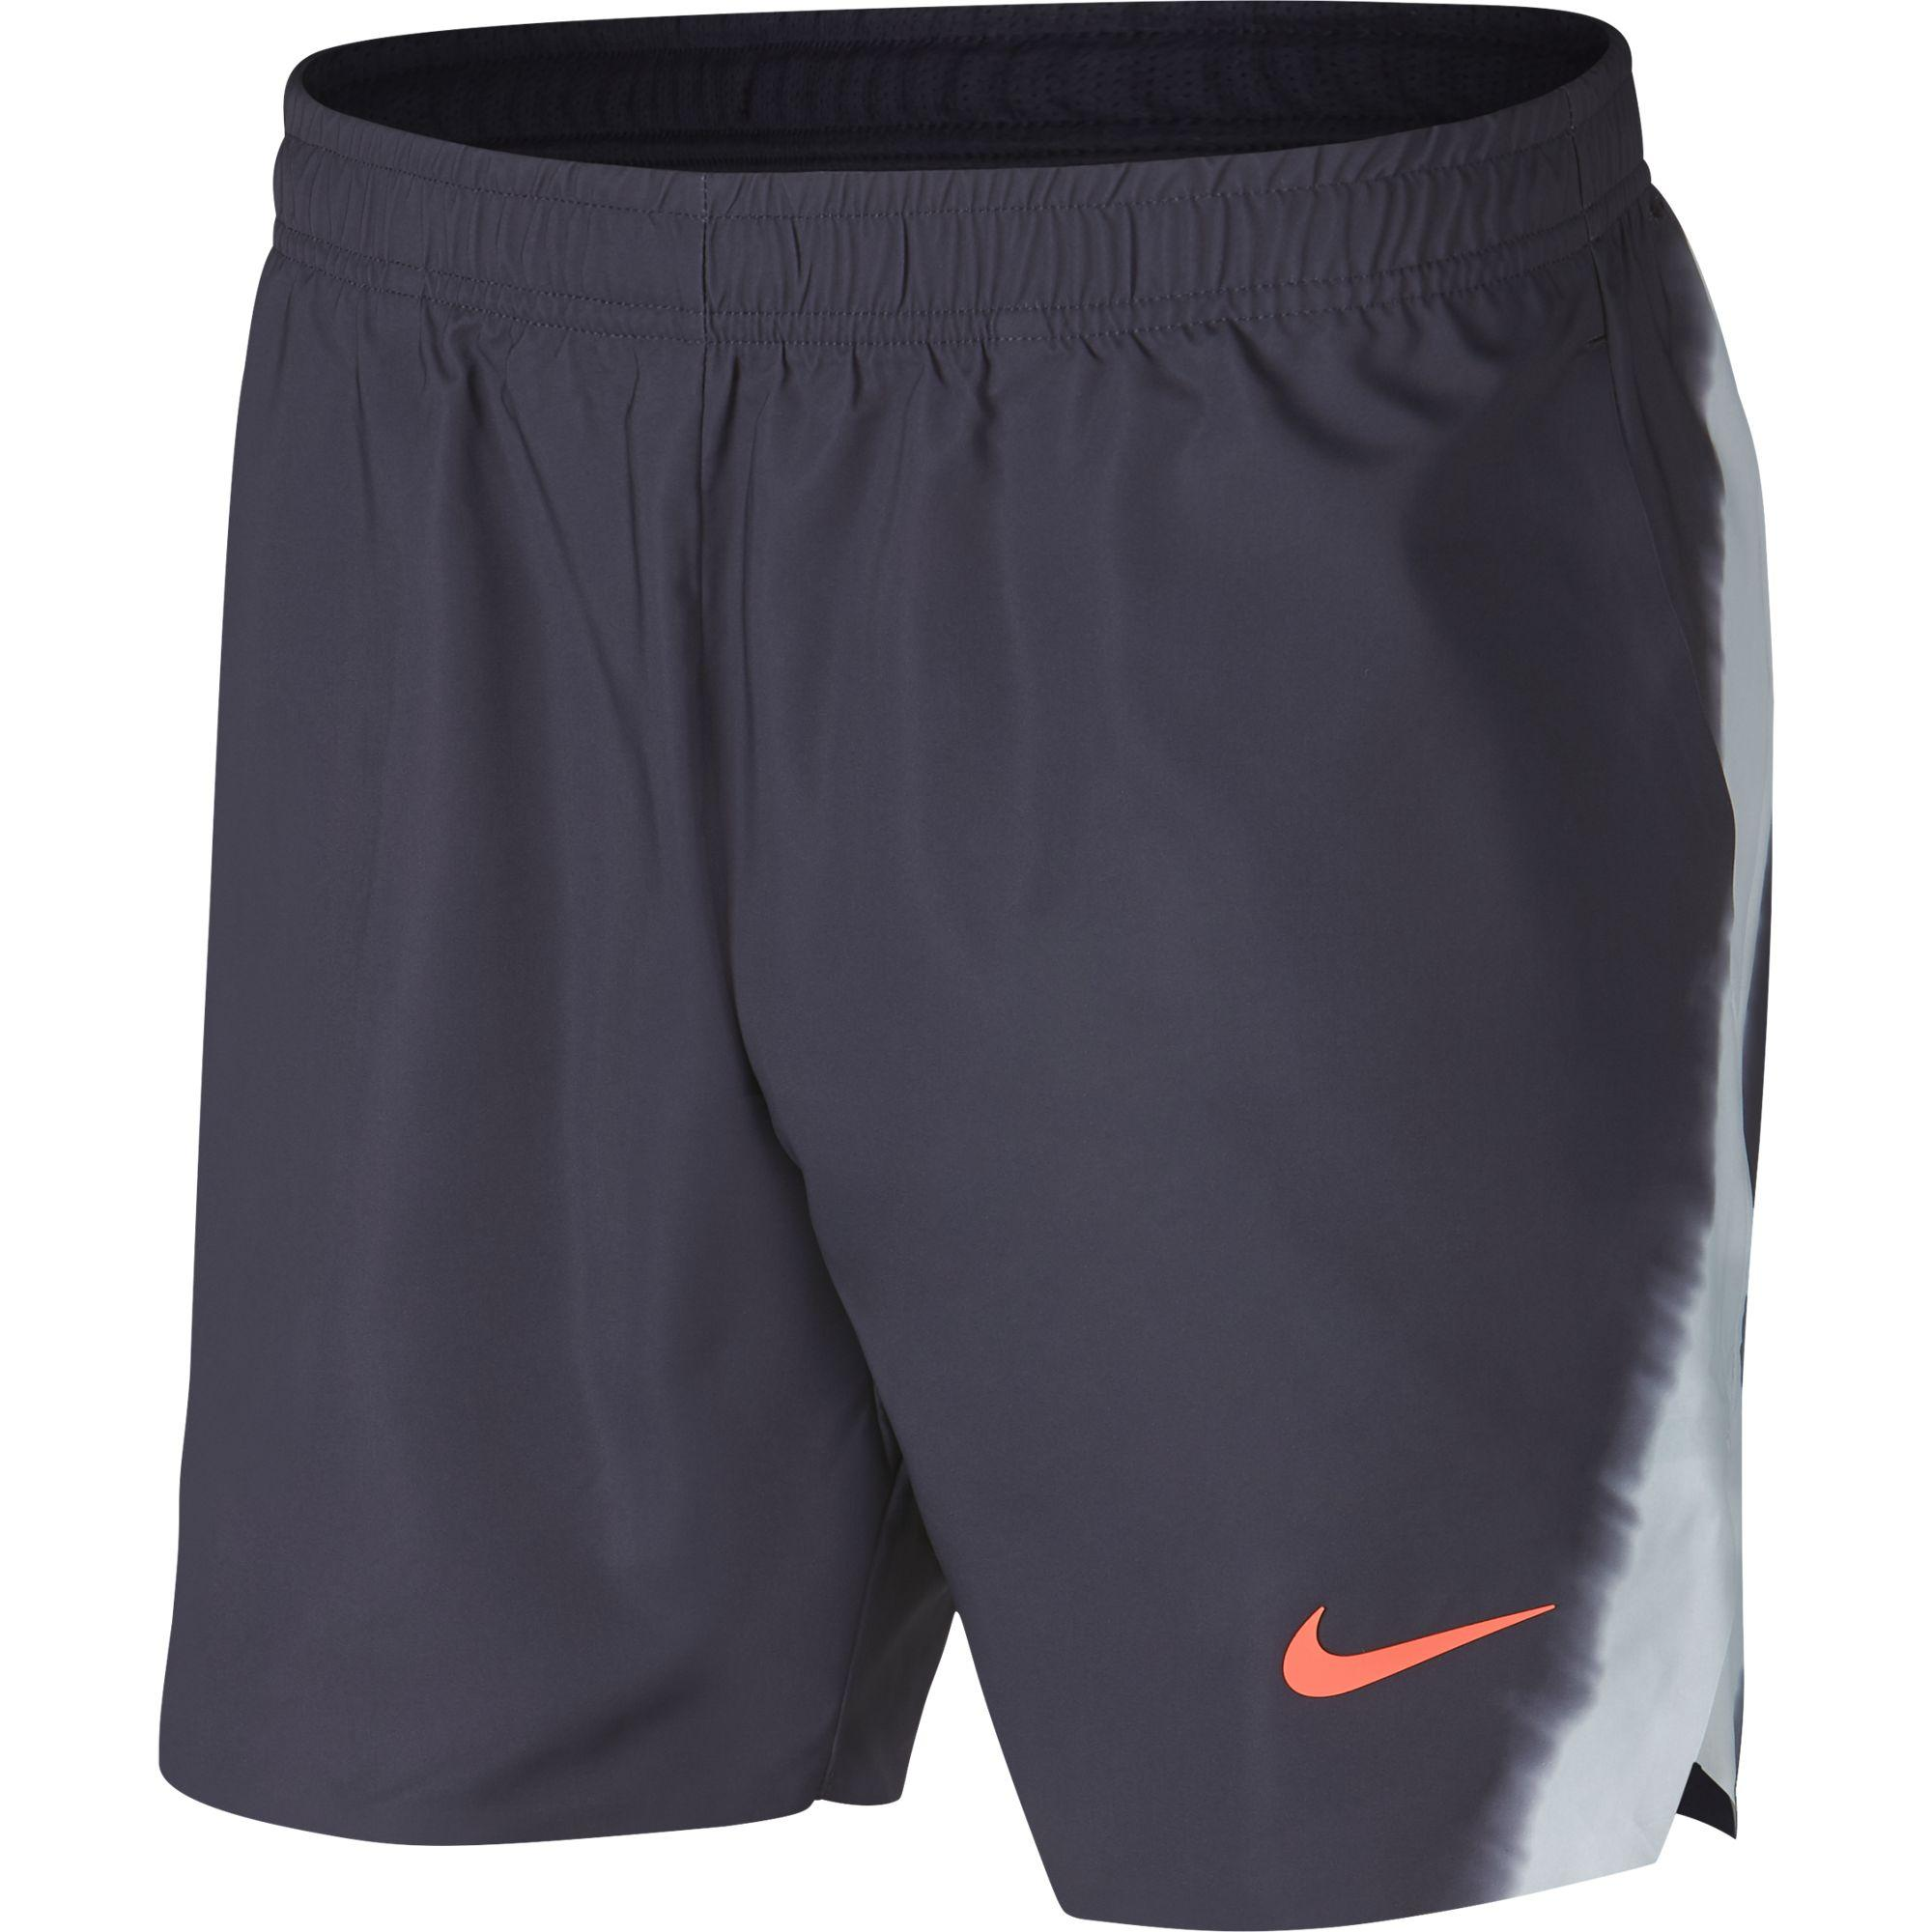 38472b151a9c Nike Mens Dri-FIT Flex Rafa Ace 7 Inch Shorts - Gridiron Pure Platinum -  Tennisnuts.com